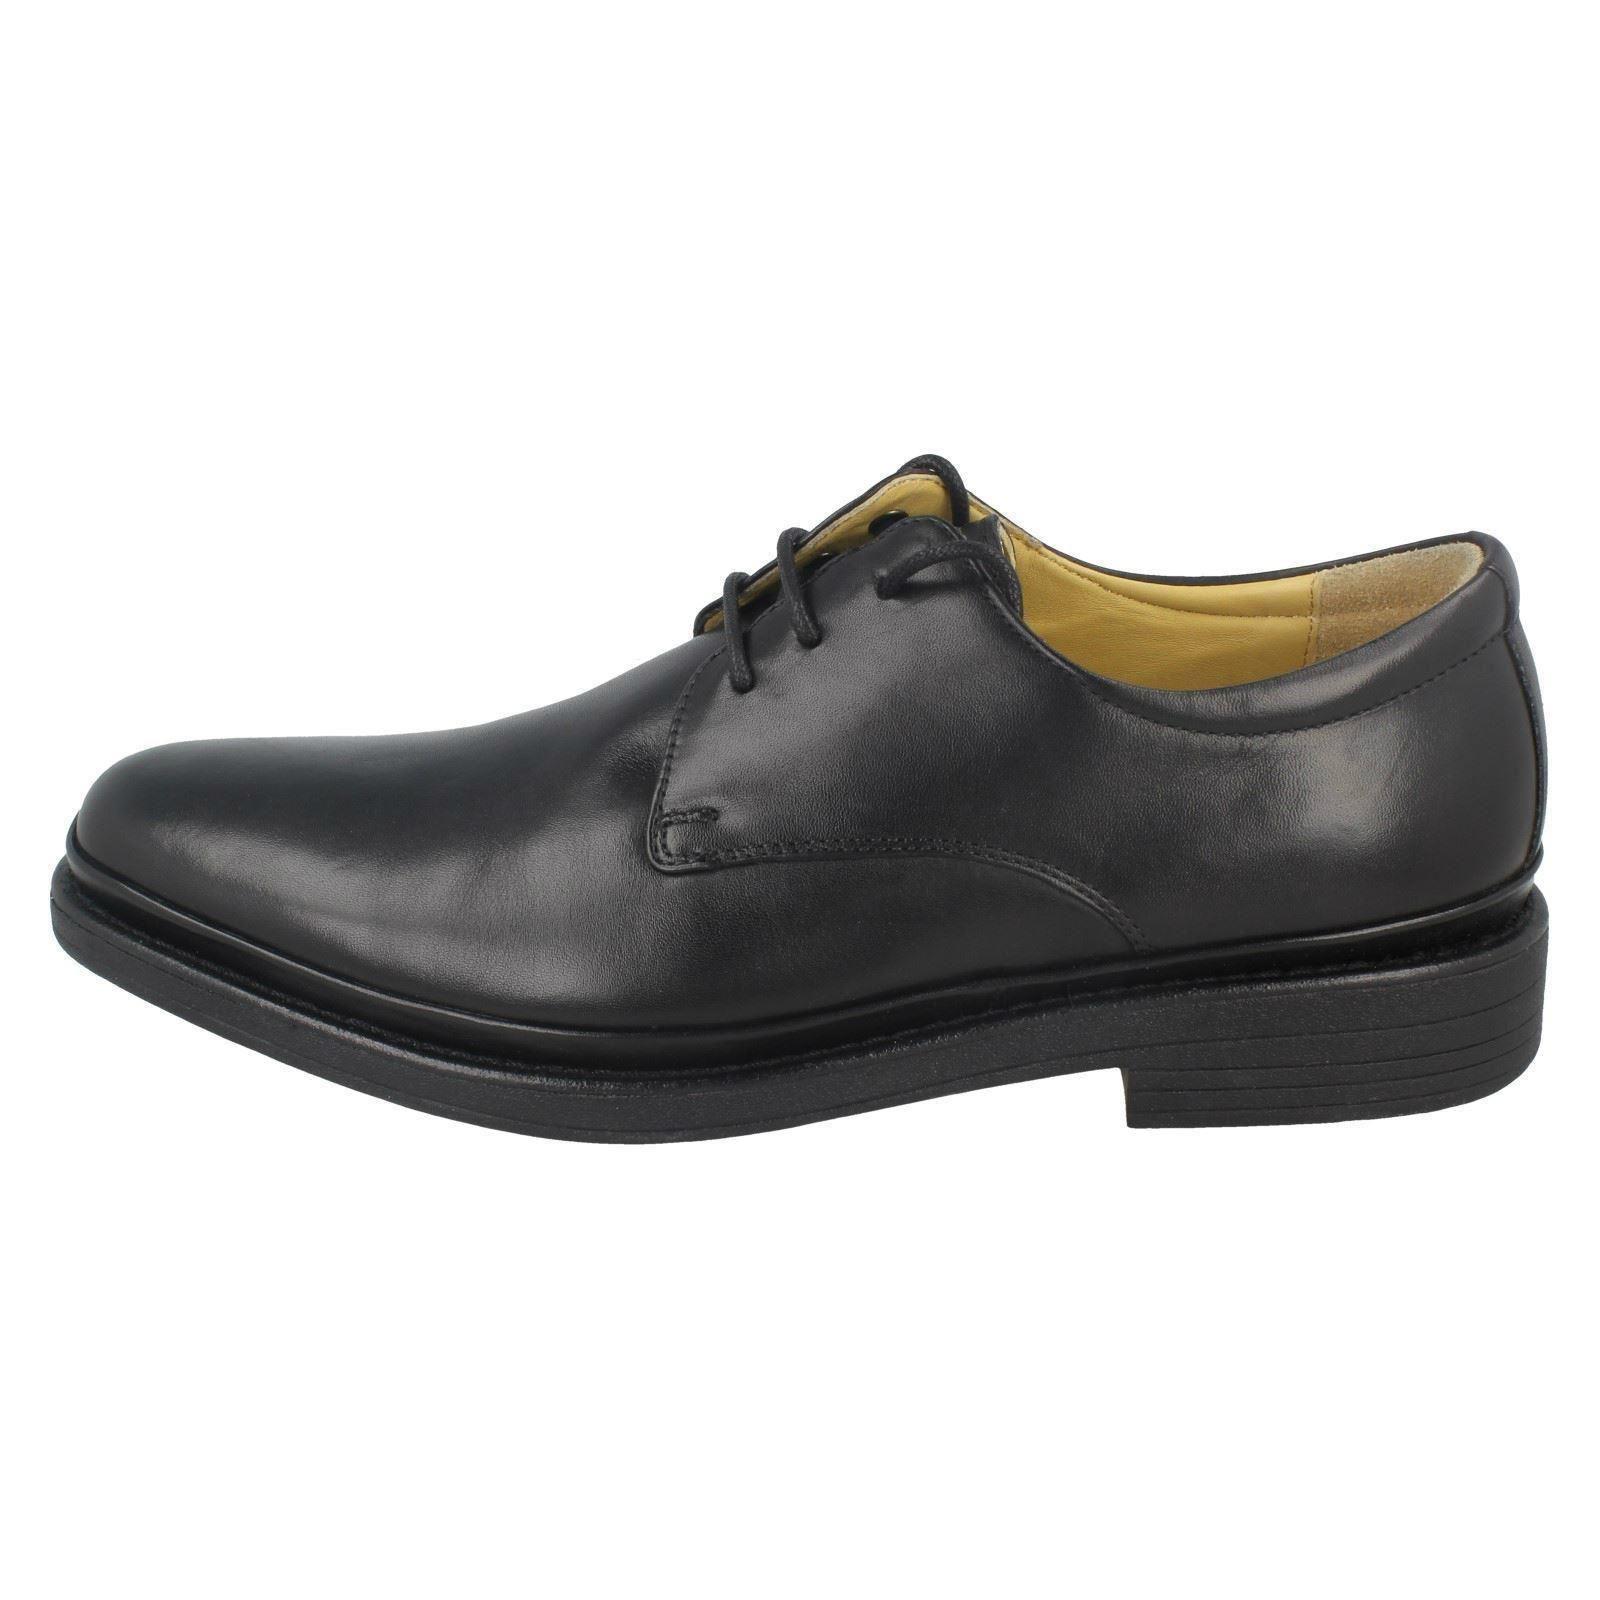 sale retailer 0394c d3239 ... NIKE BIG NIKE HIGH Men s Dark Obsidian Vibrant Yellow Trainers        40a8ea ...